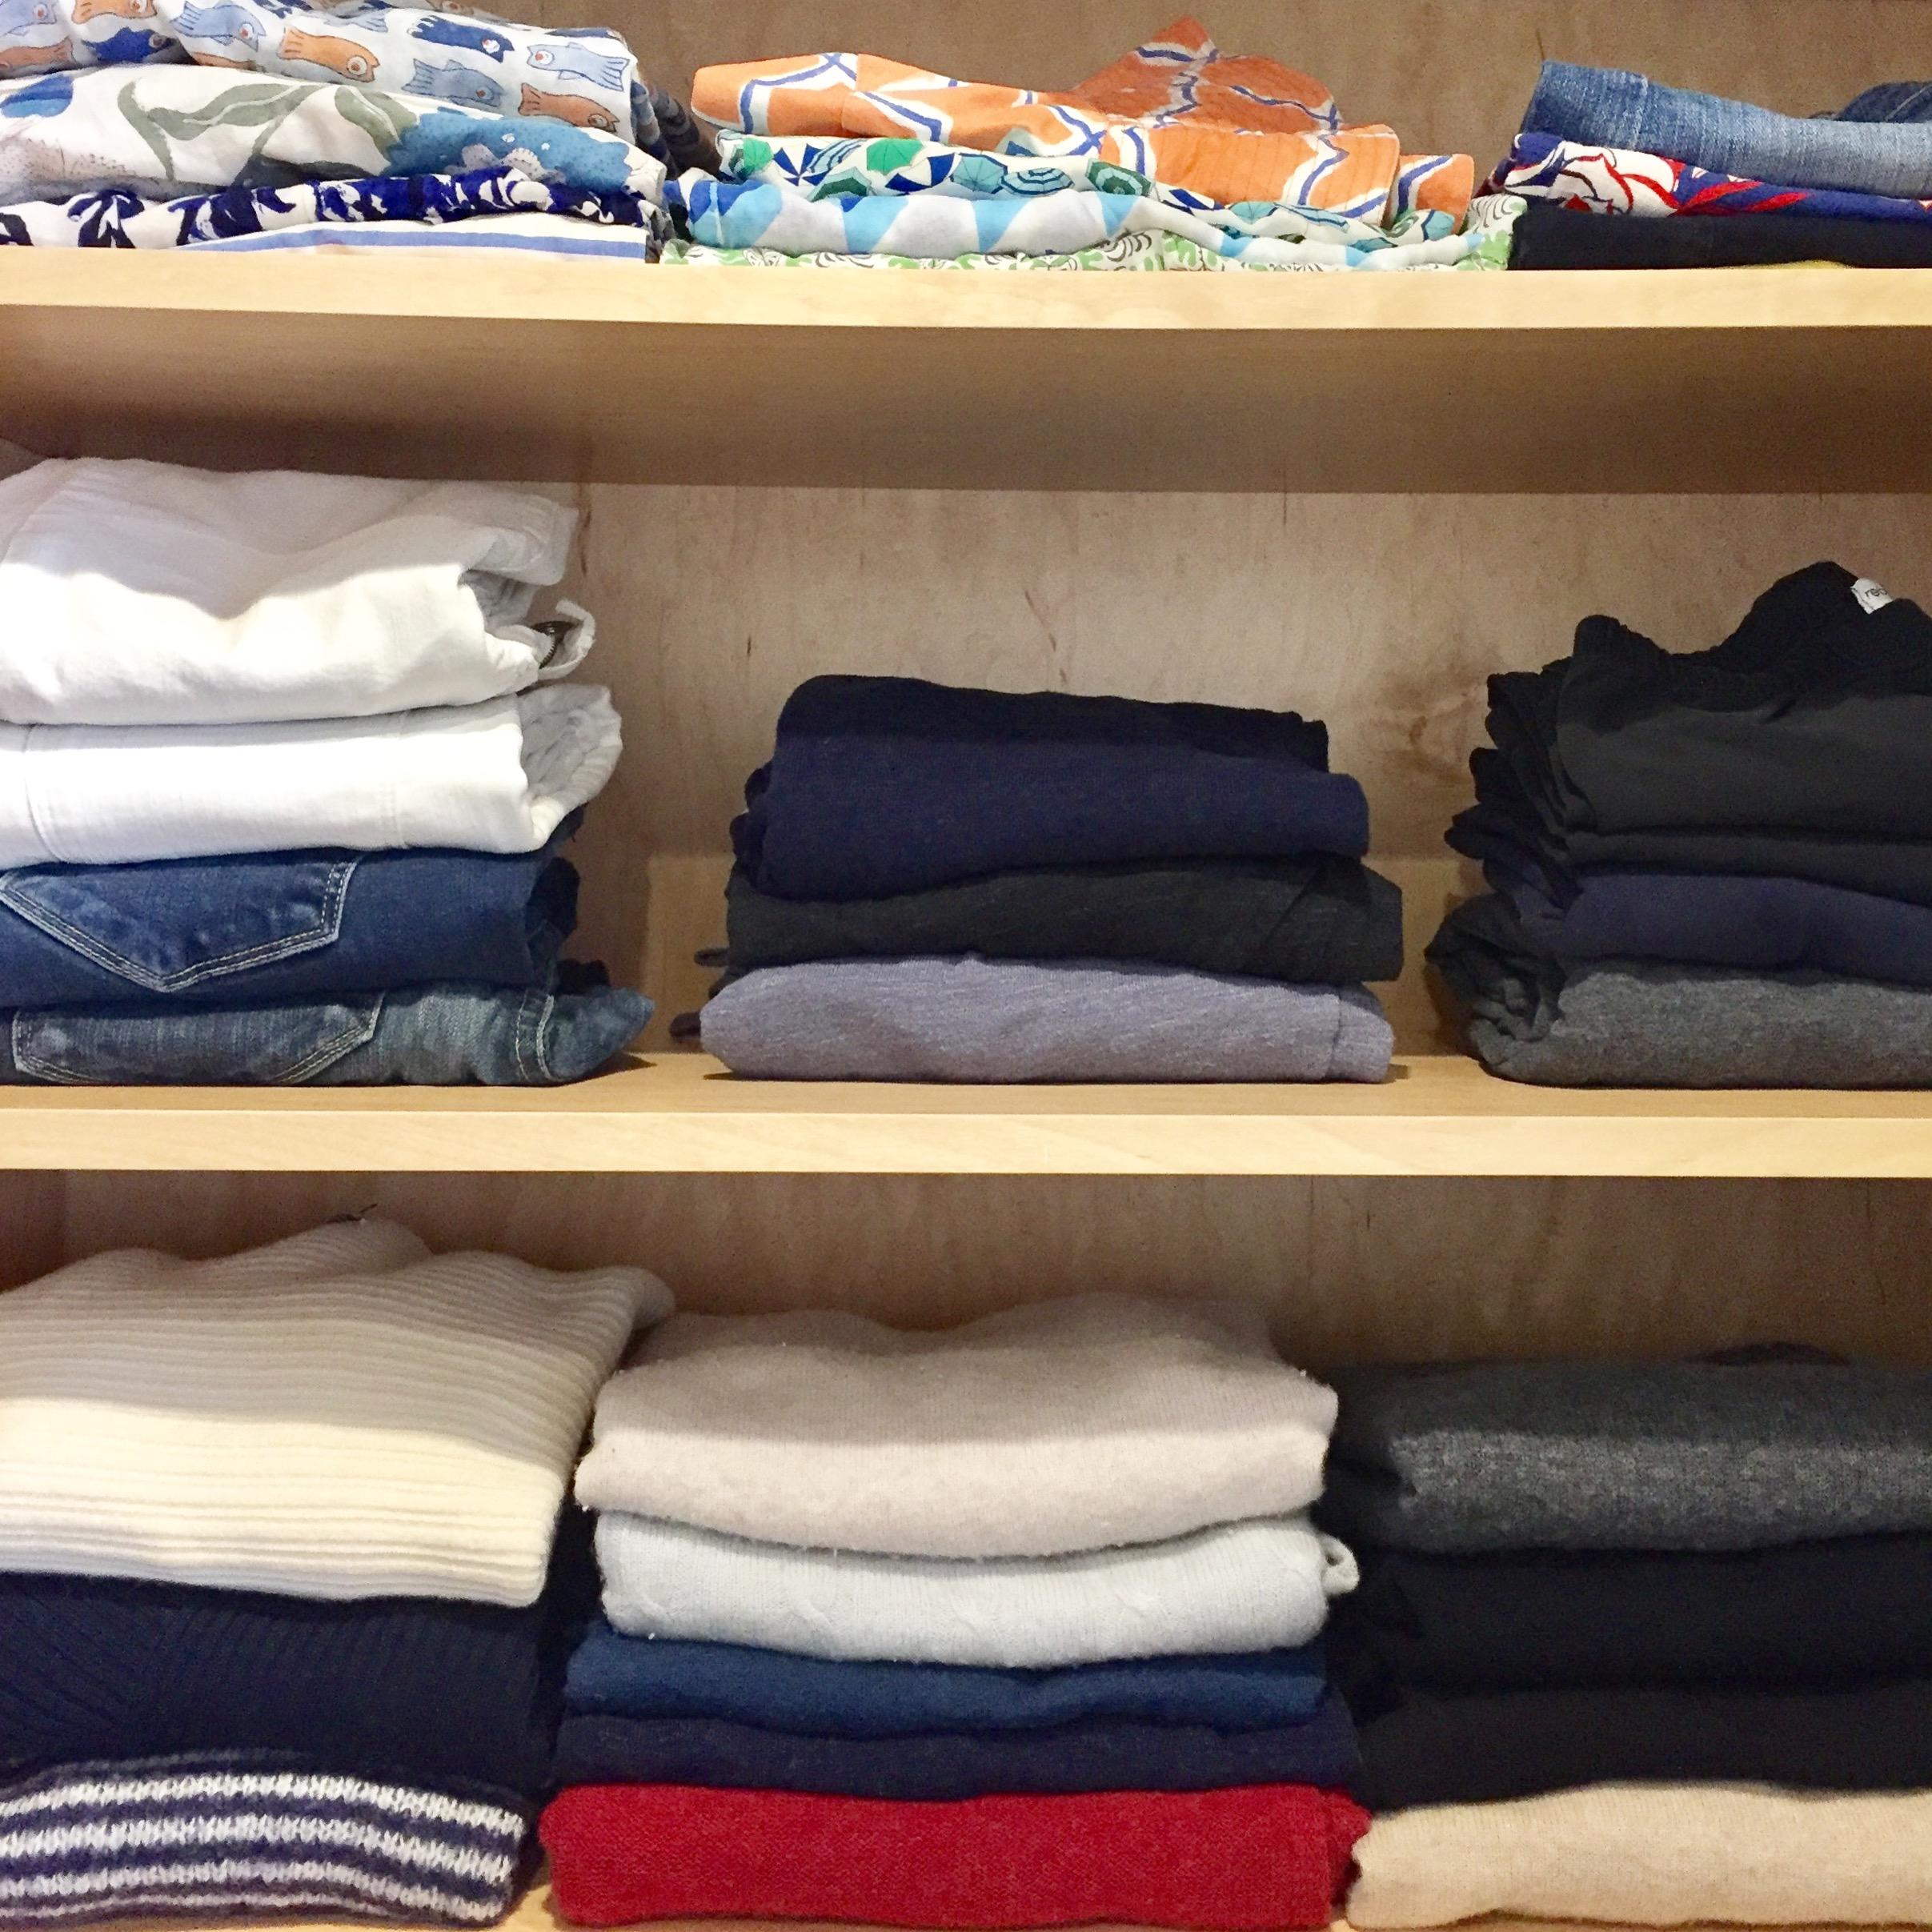 1_Henry & Higby_Folded Clothing Organization.JPG